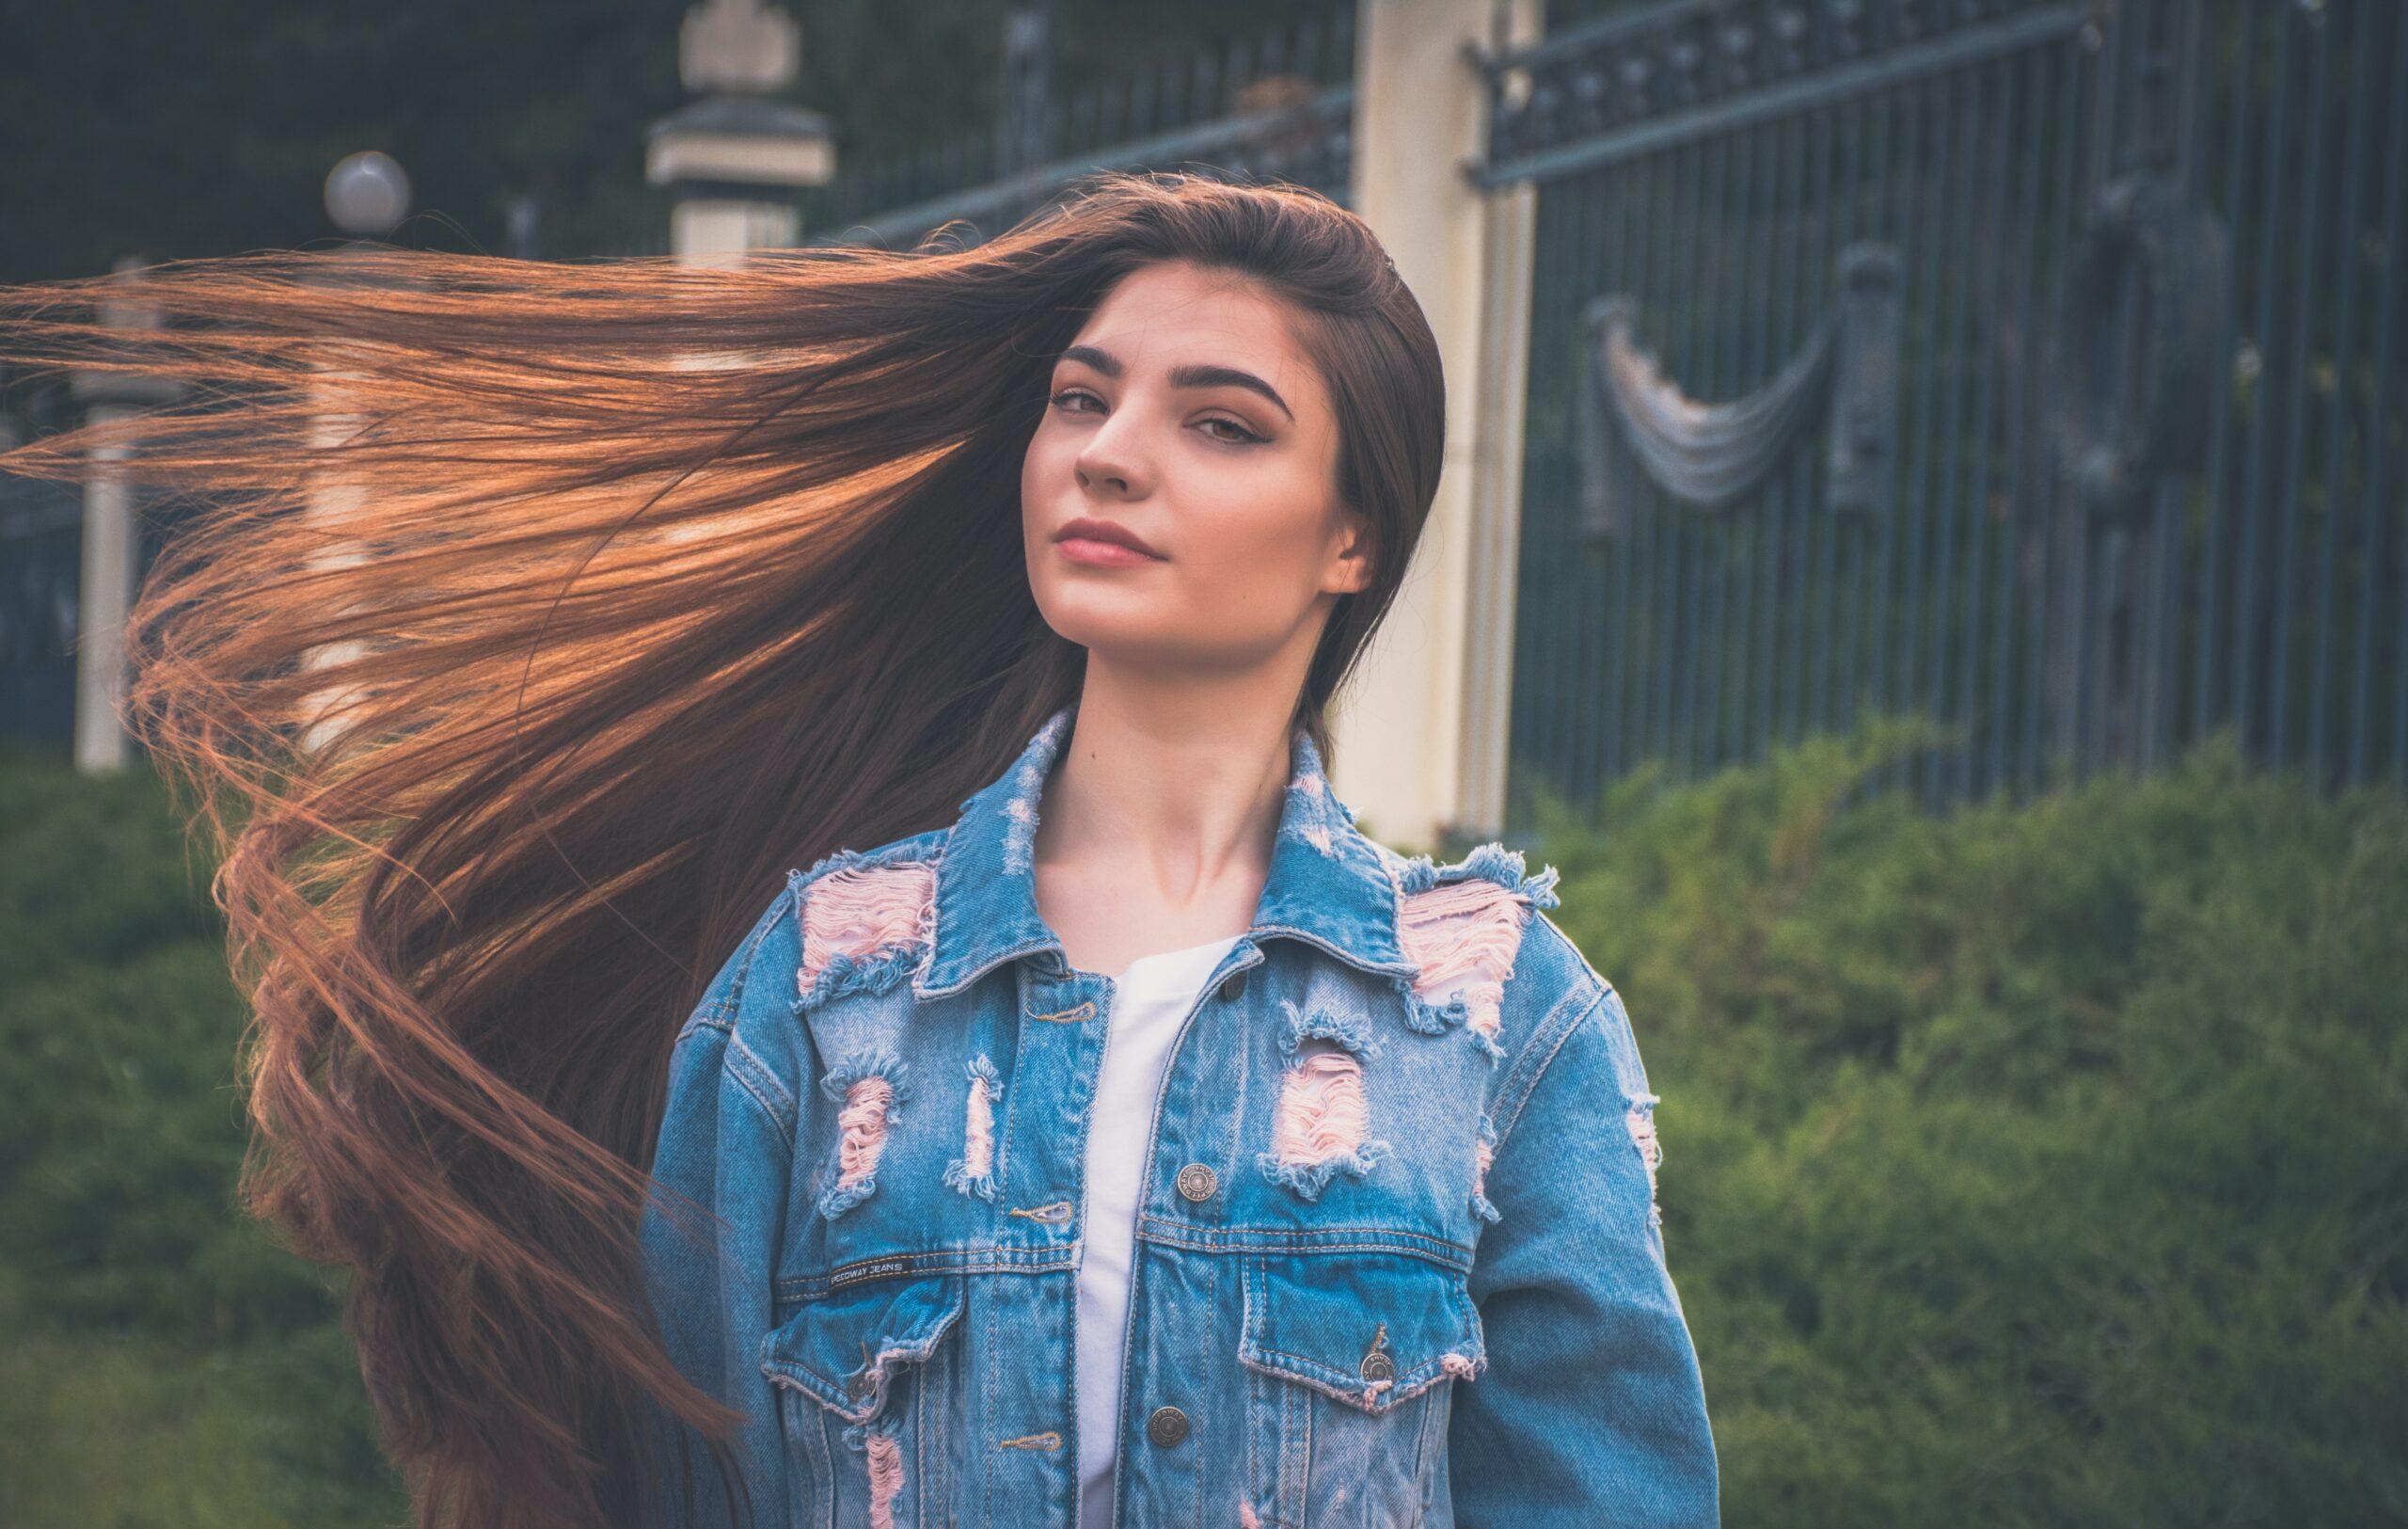 dermaroller for hair growth